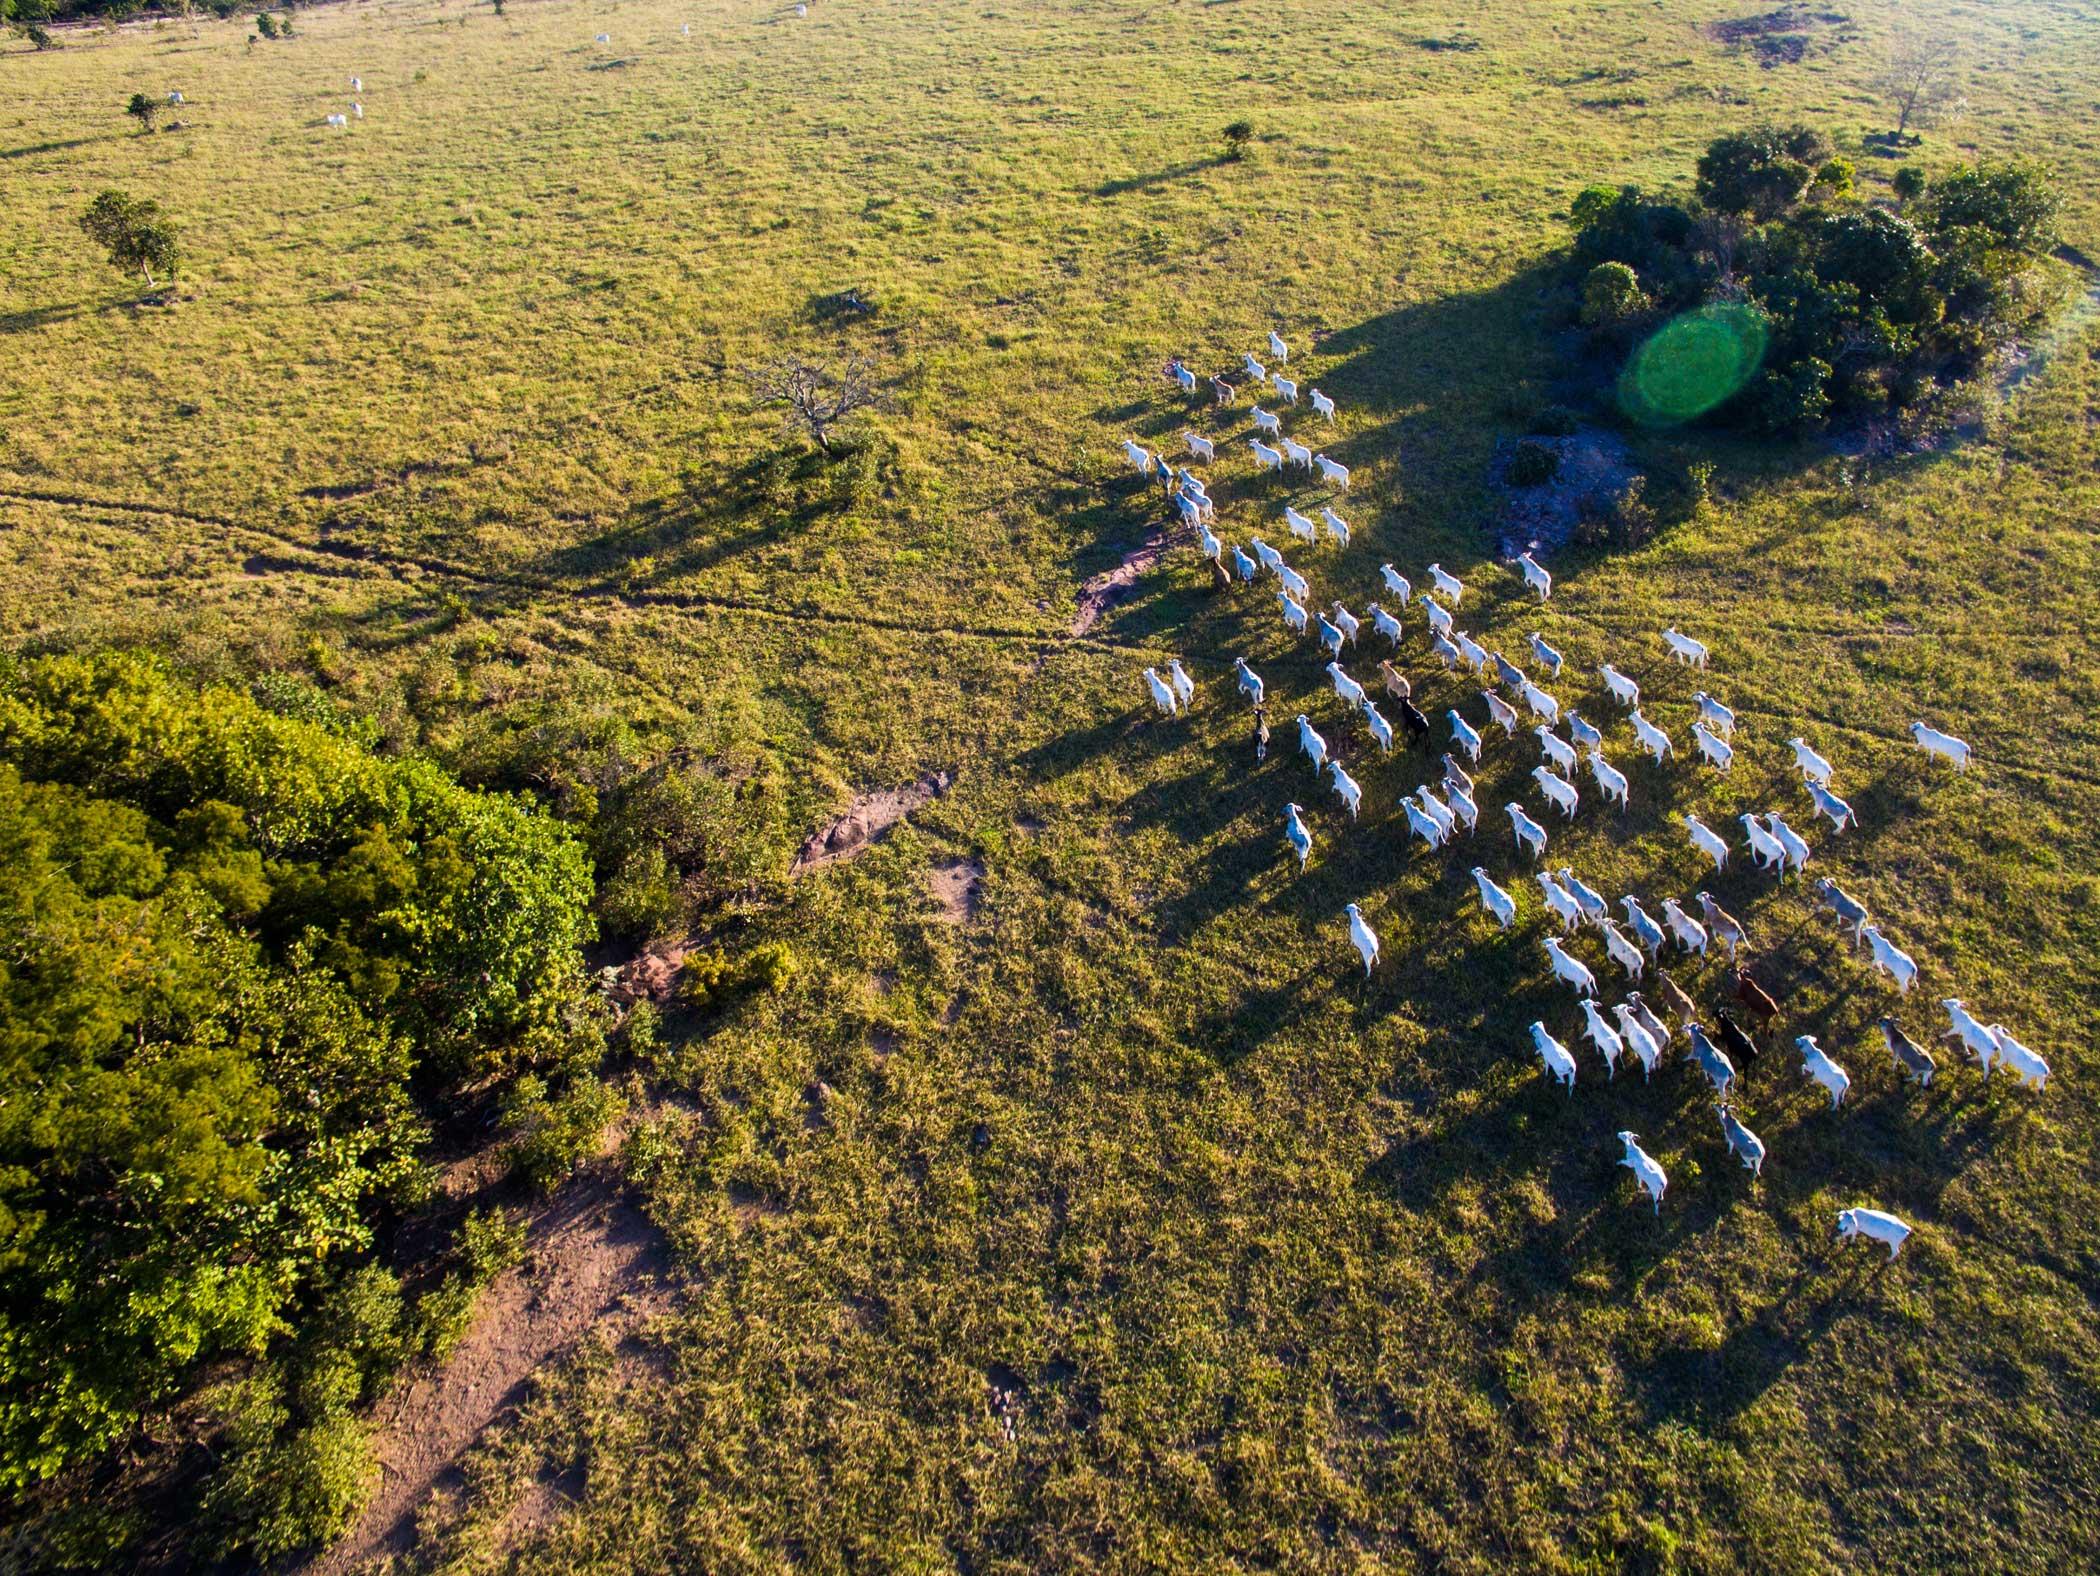 A herd in the Pantanal in Taboco, Brazil.